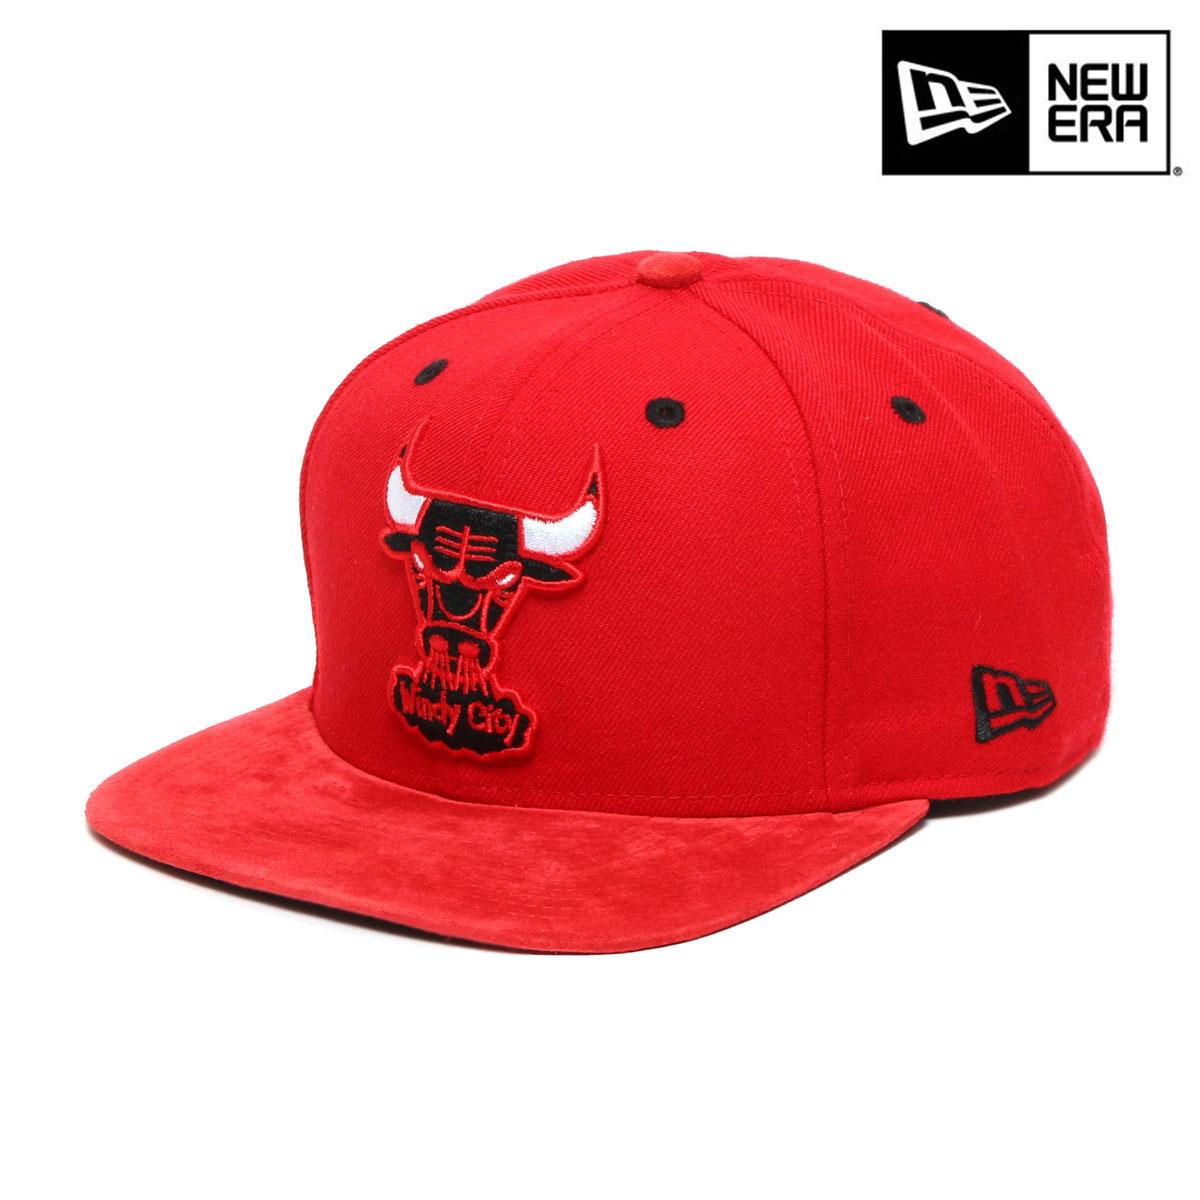 atmos pink  NEW ERA 9FIFTY ORIGINAL FIT SNAPBACK SUEDE Chicago Bulls ... c53b6781fc5